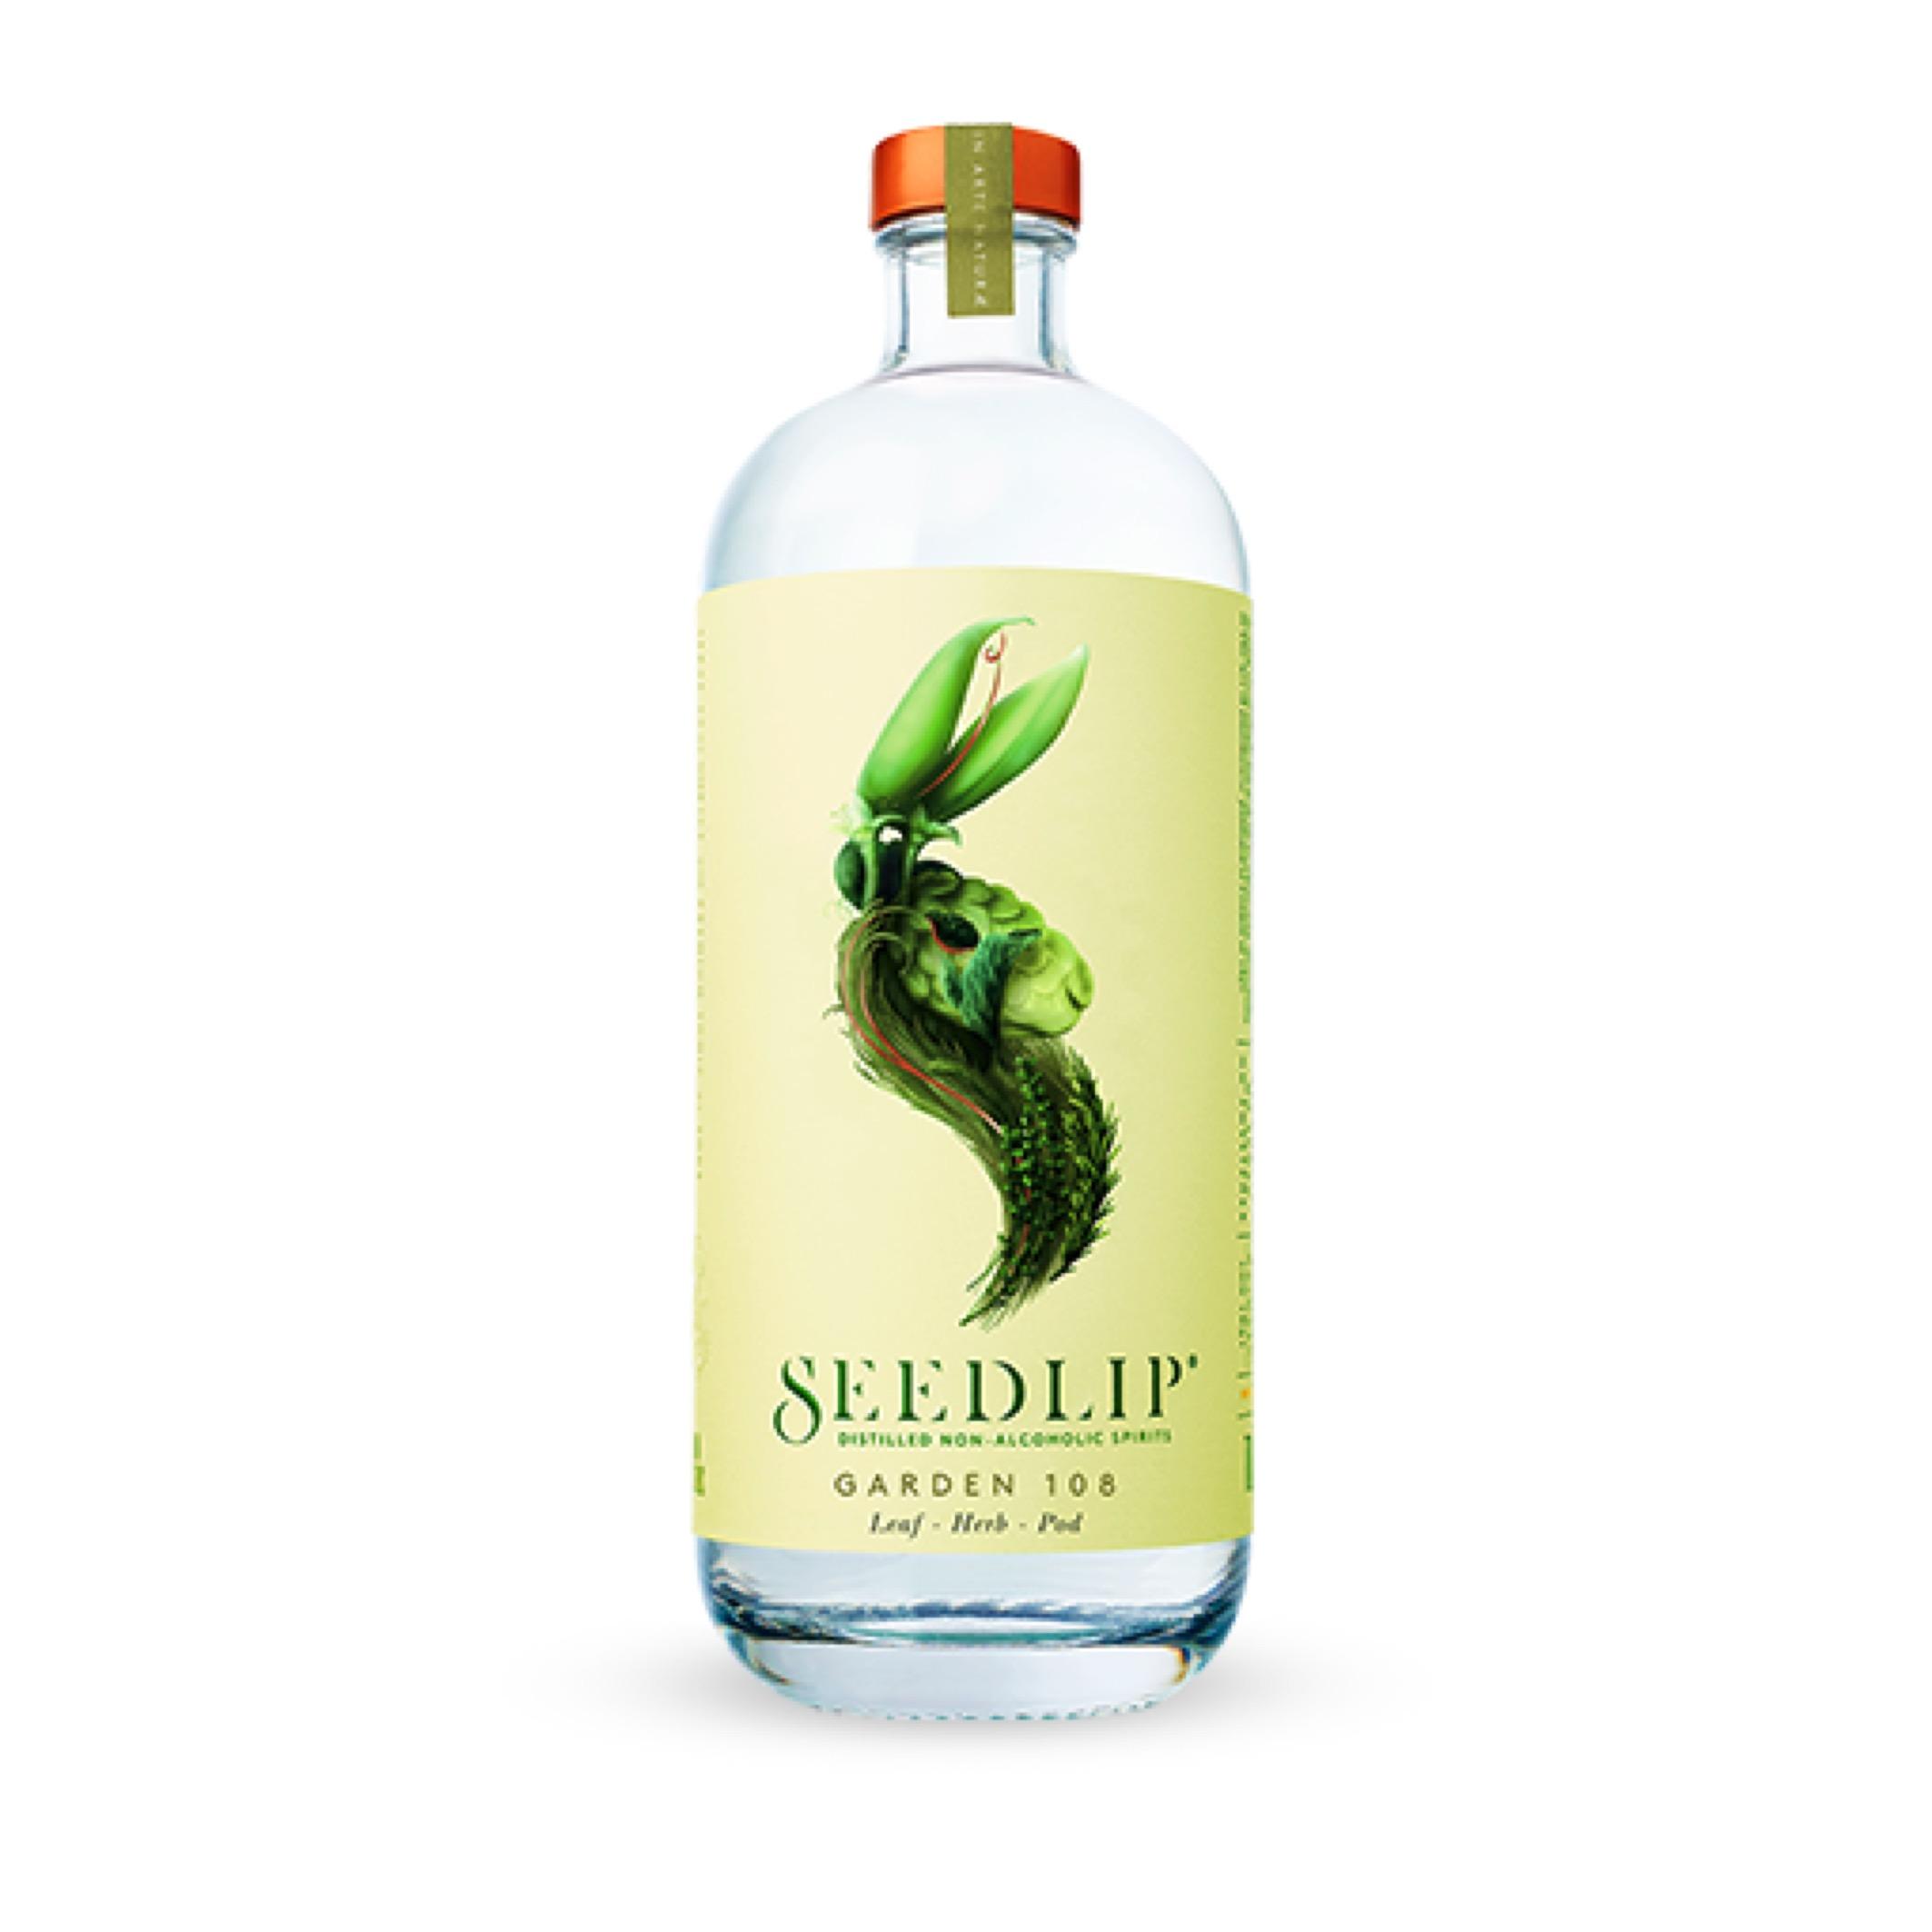 SEEDLIP - Garden 108